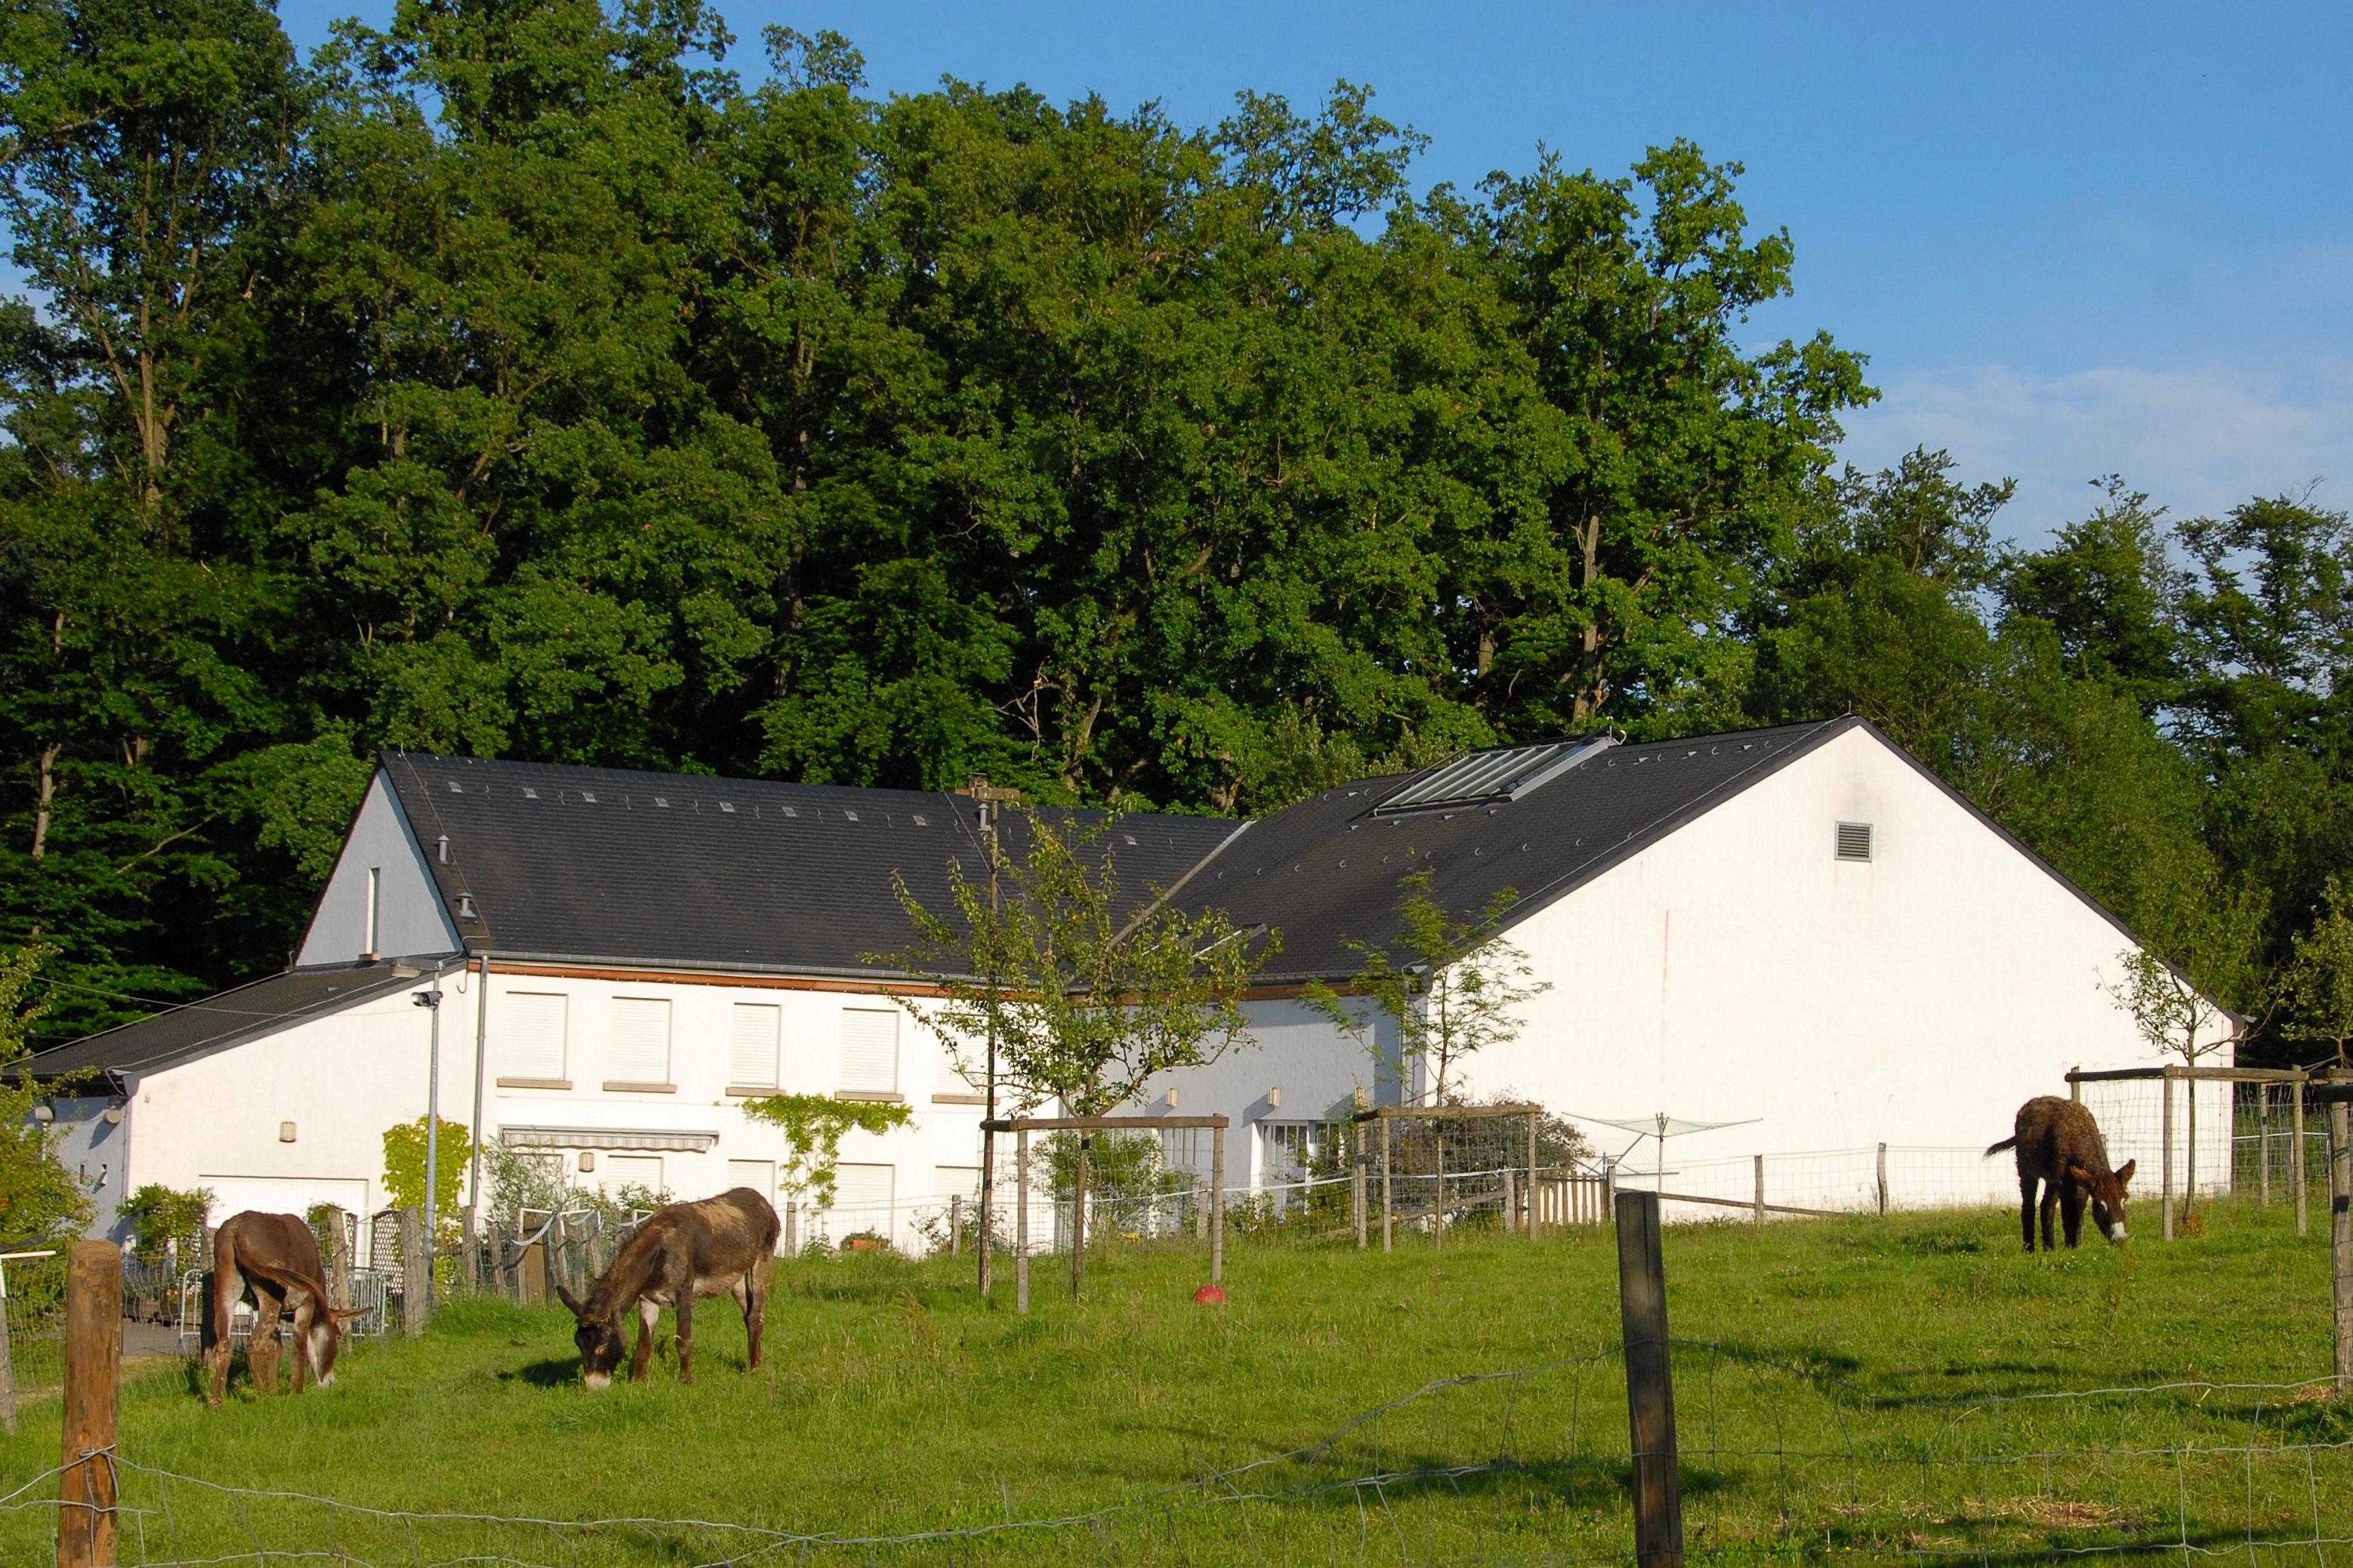 da4156f8f9dab4 File Haus vun der Natur h2007-06-24.JPG - Wikimedia Commons